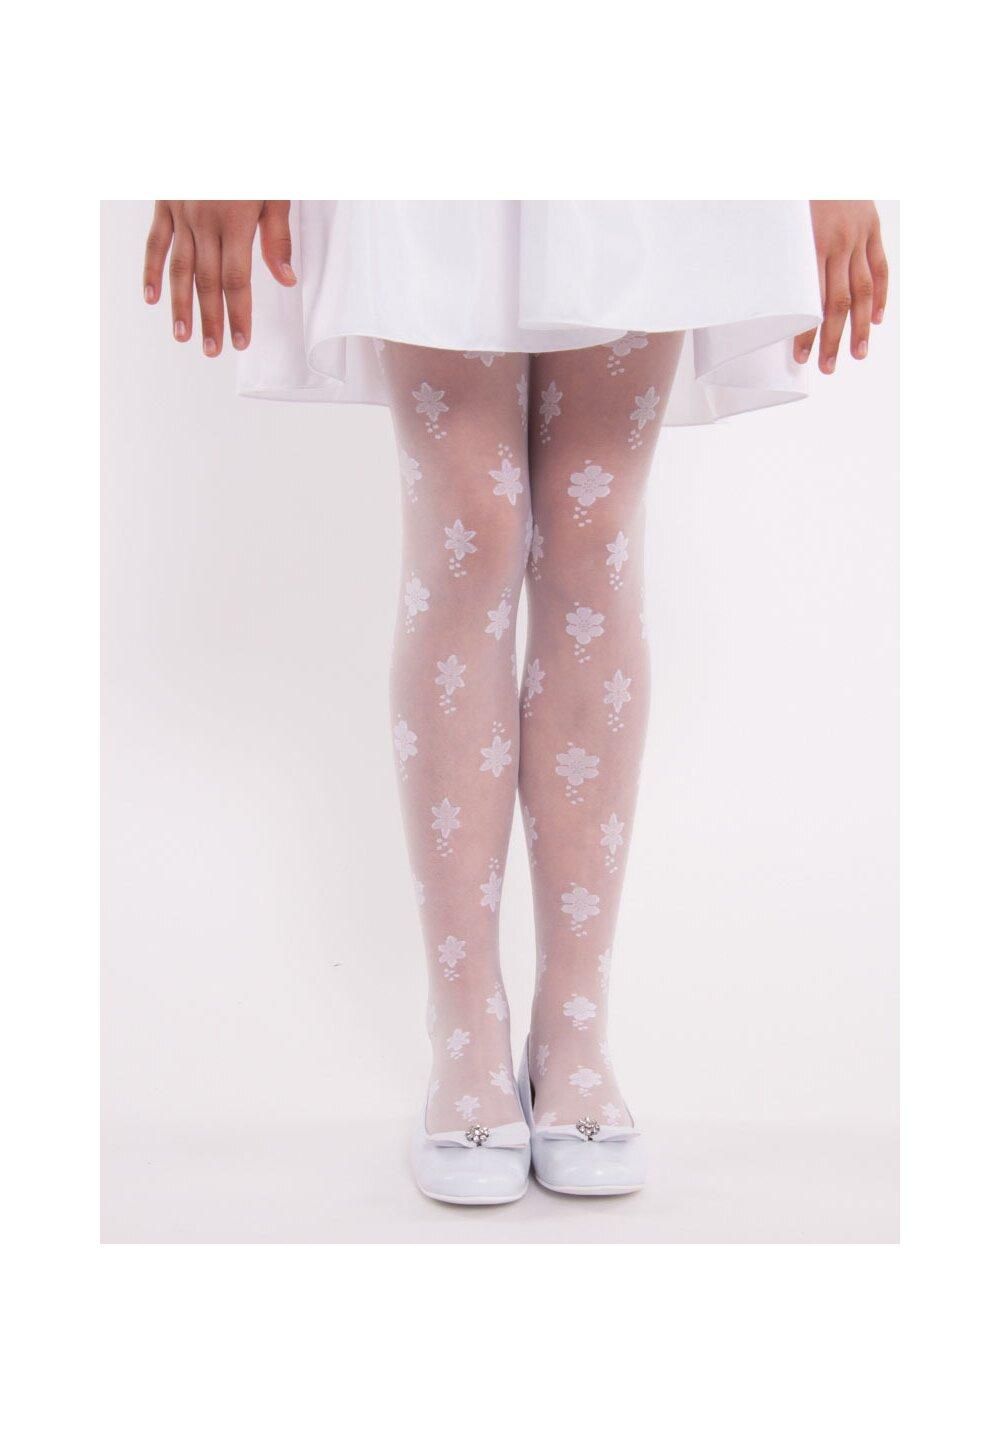 Ciorapi cu chilot, Alicja, flori albe imagine